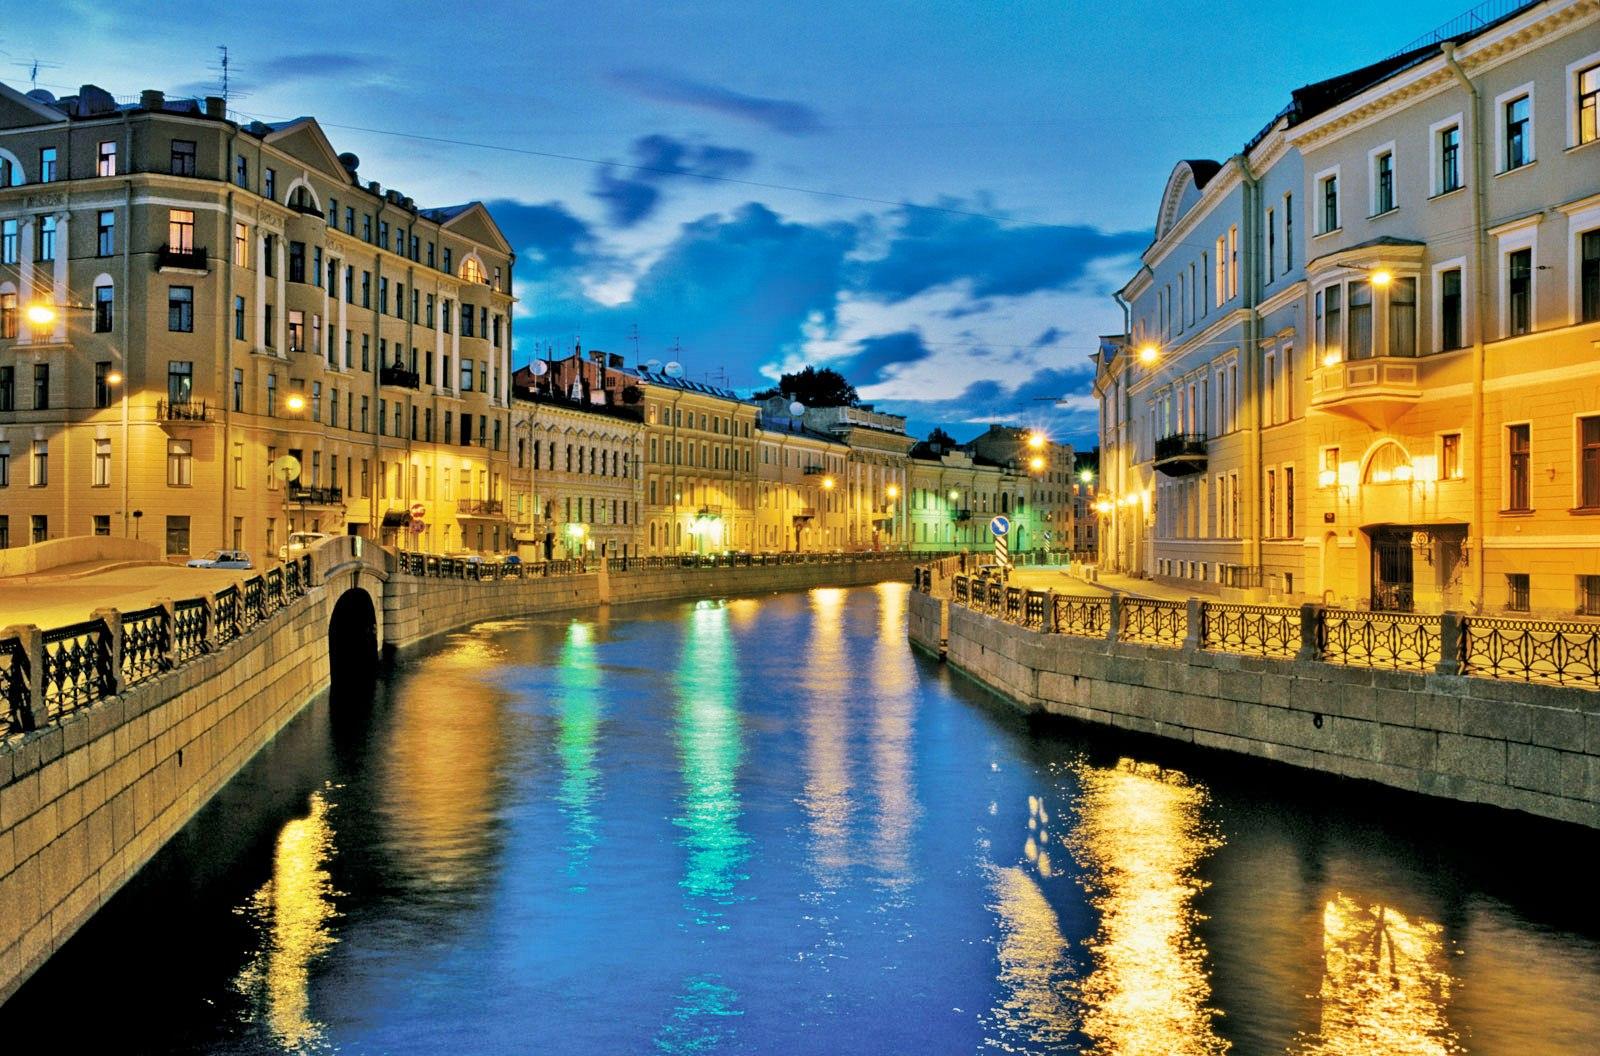 Istoria St-Petersburgului